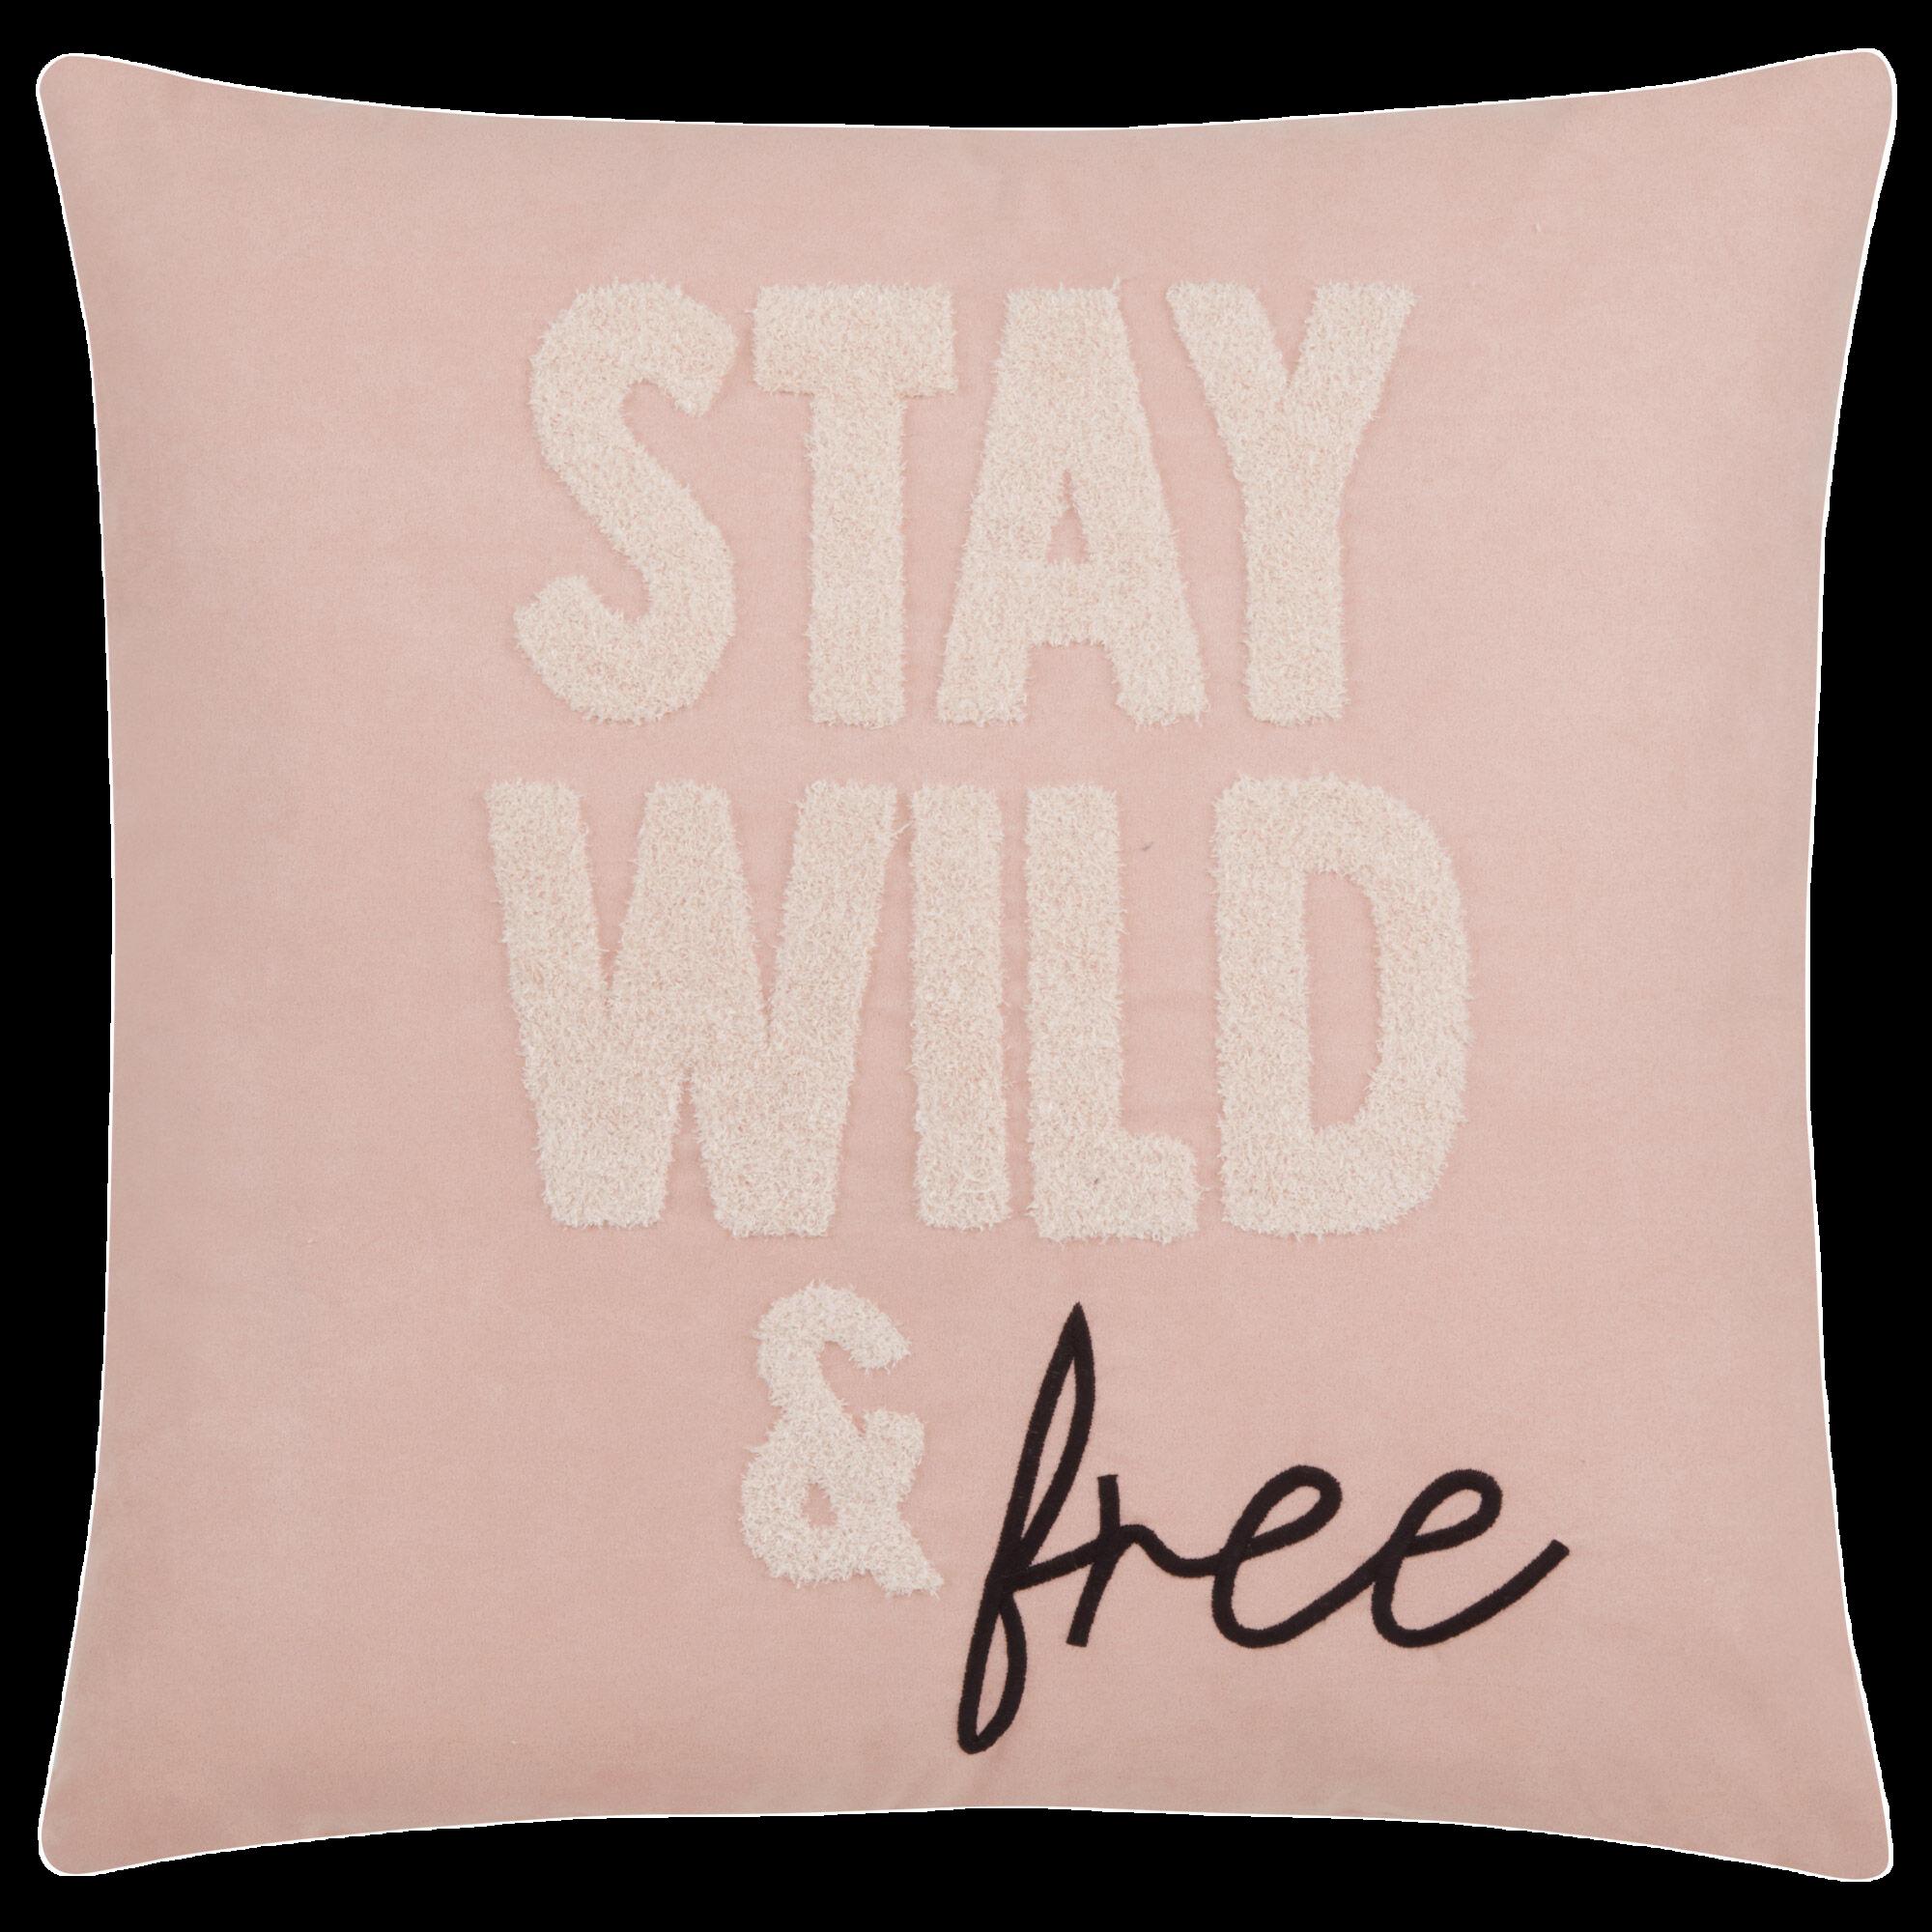 "Stay Wild & Free Decorative Pillow 18"" x 18"""